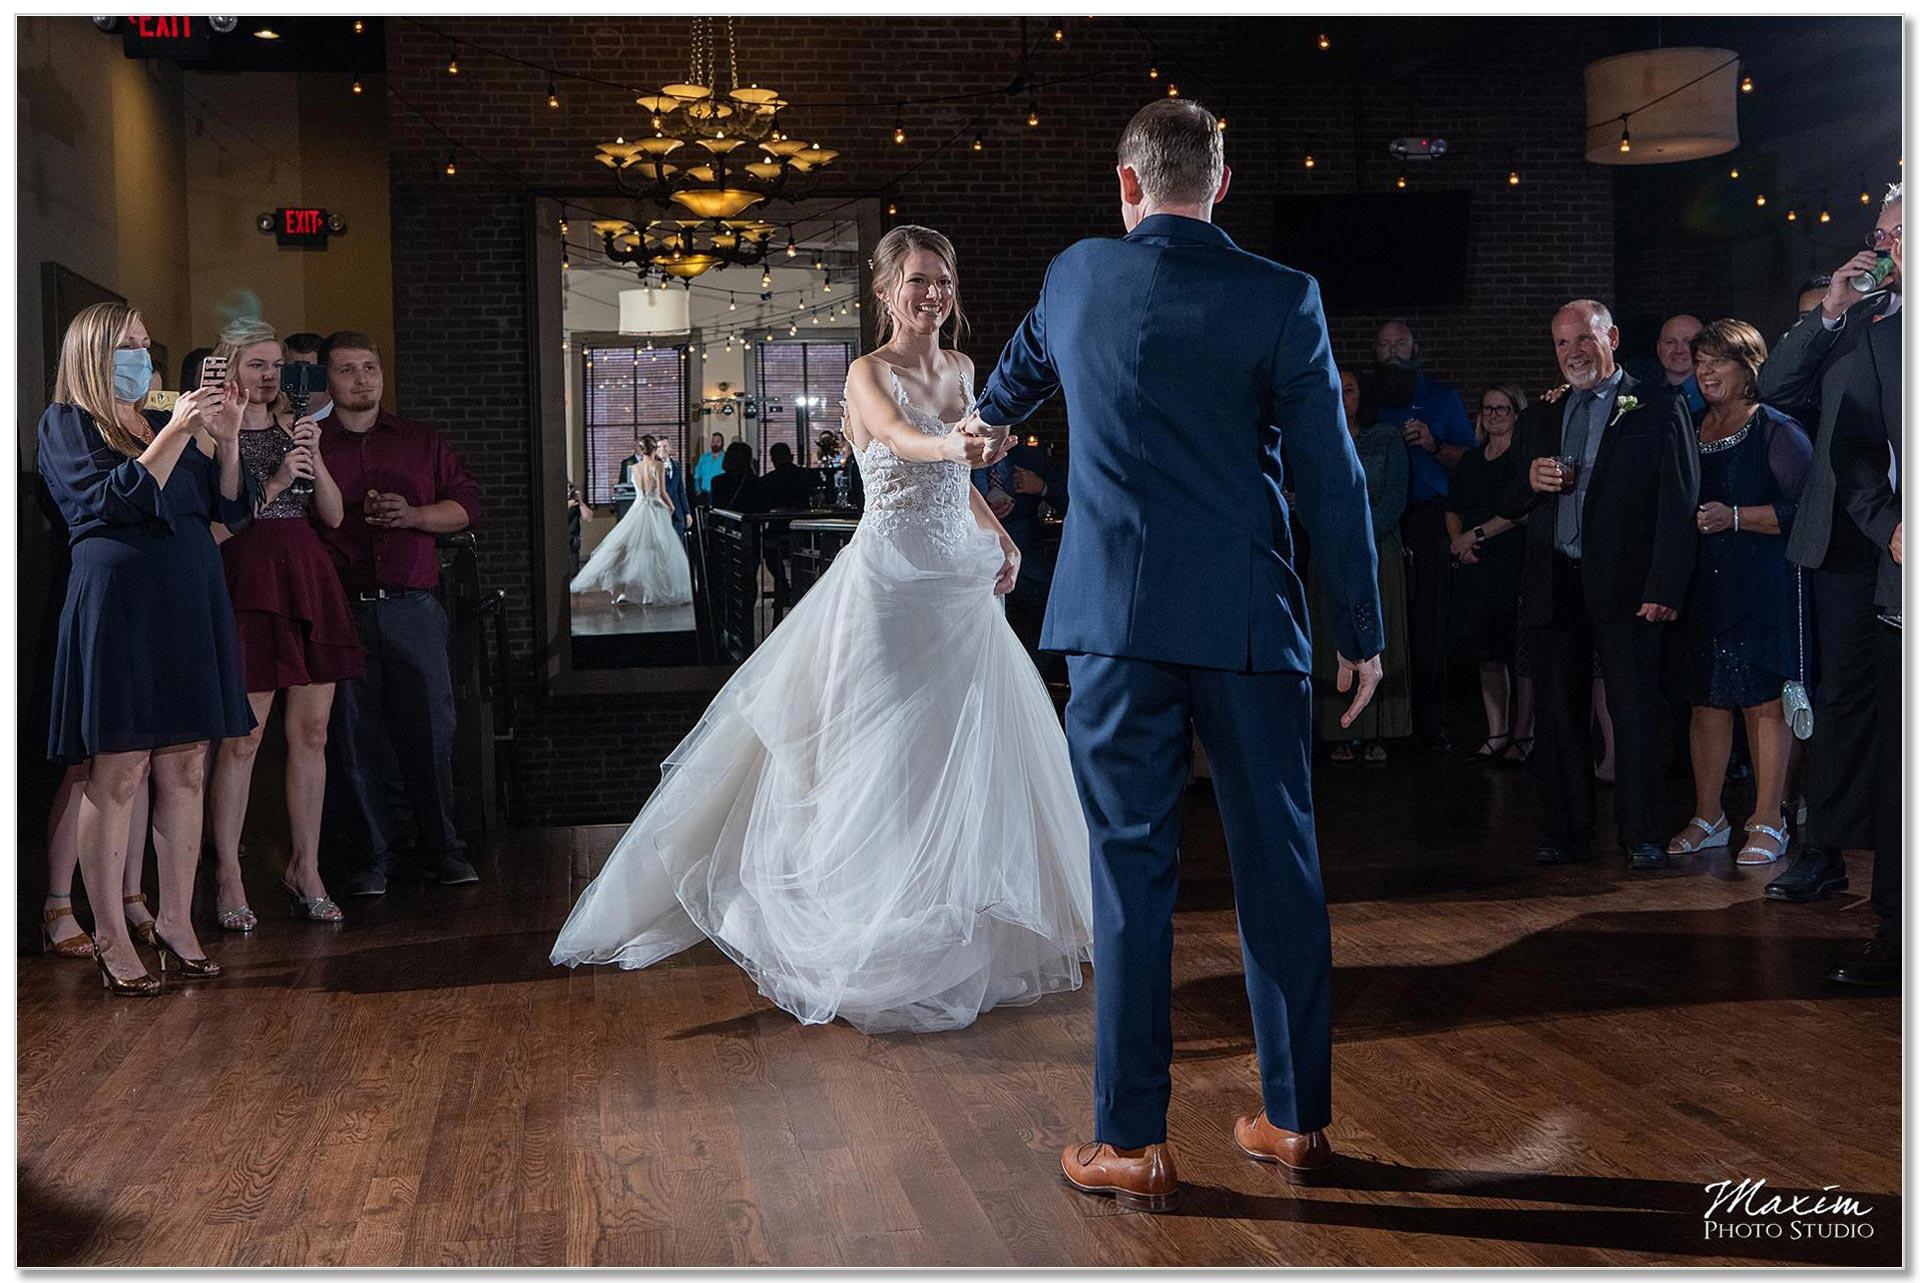 Wedding Reception First dance by Bud Walters